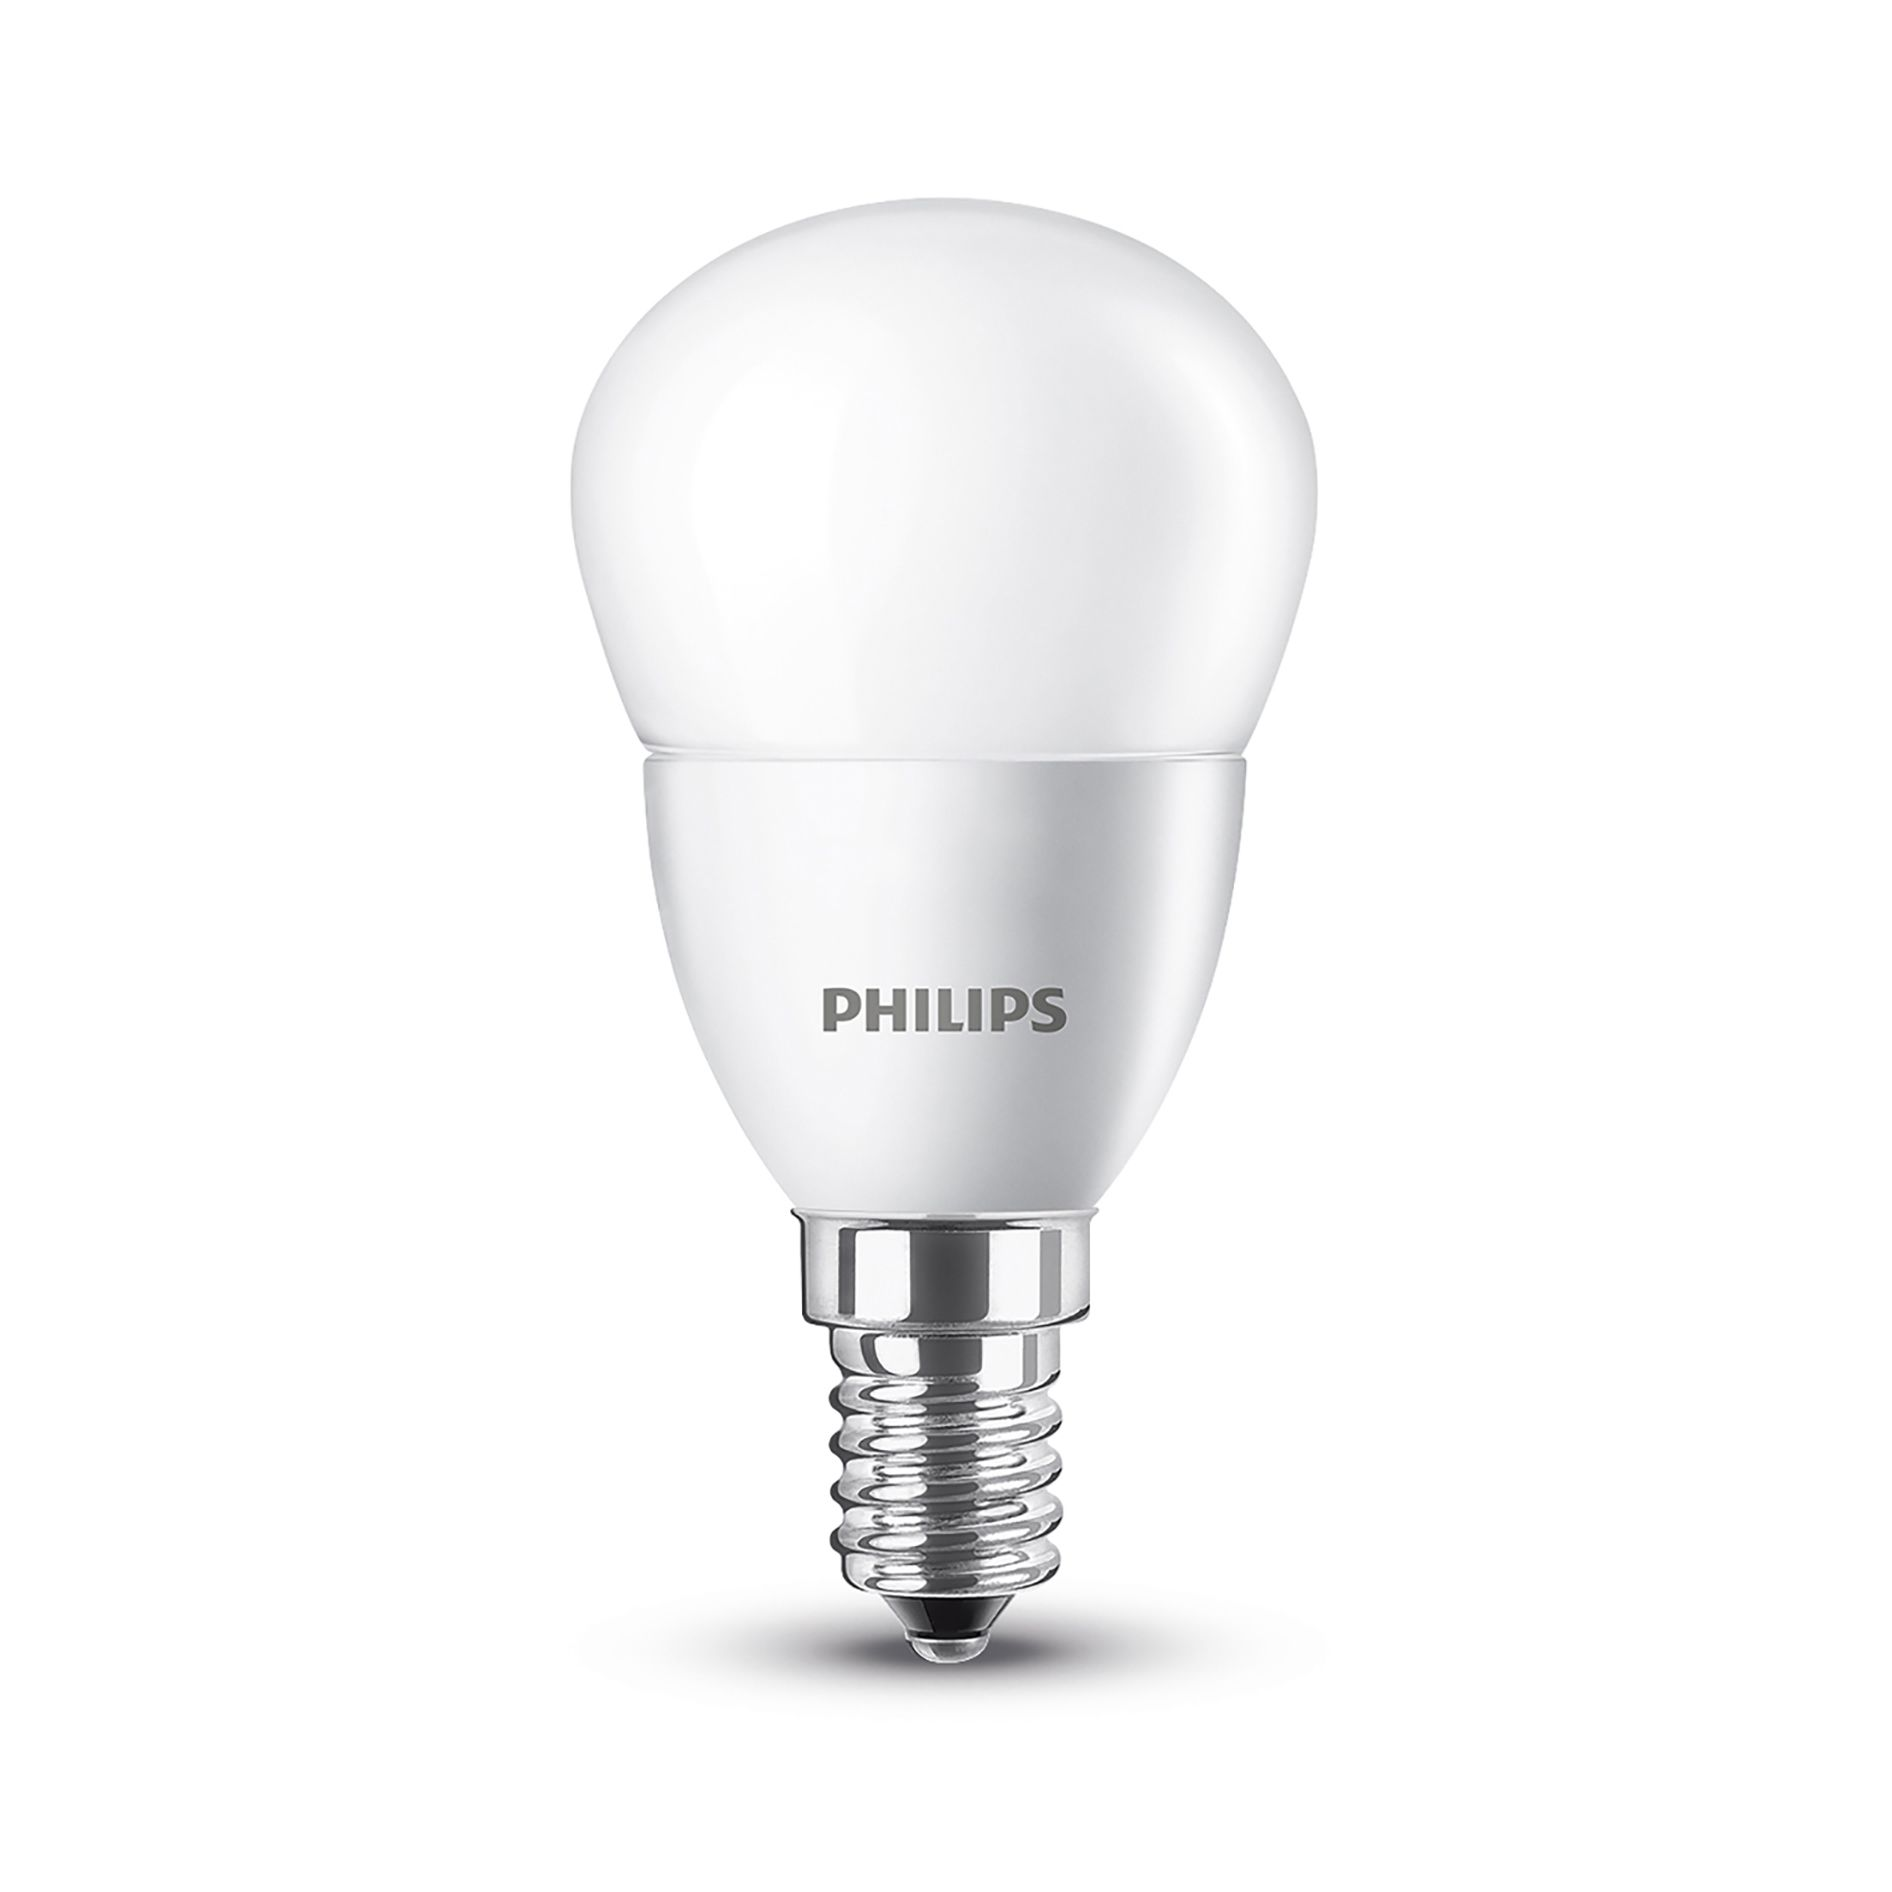 Philips E14 470lm Led Ball Light Bulb